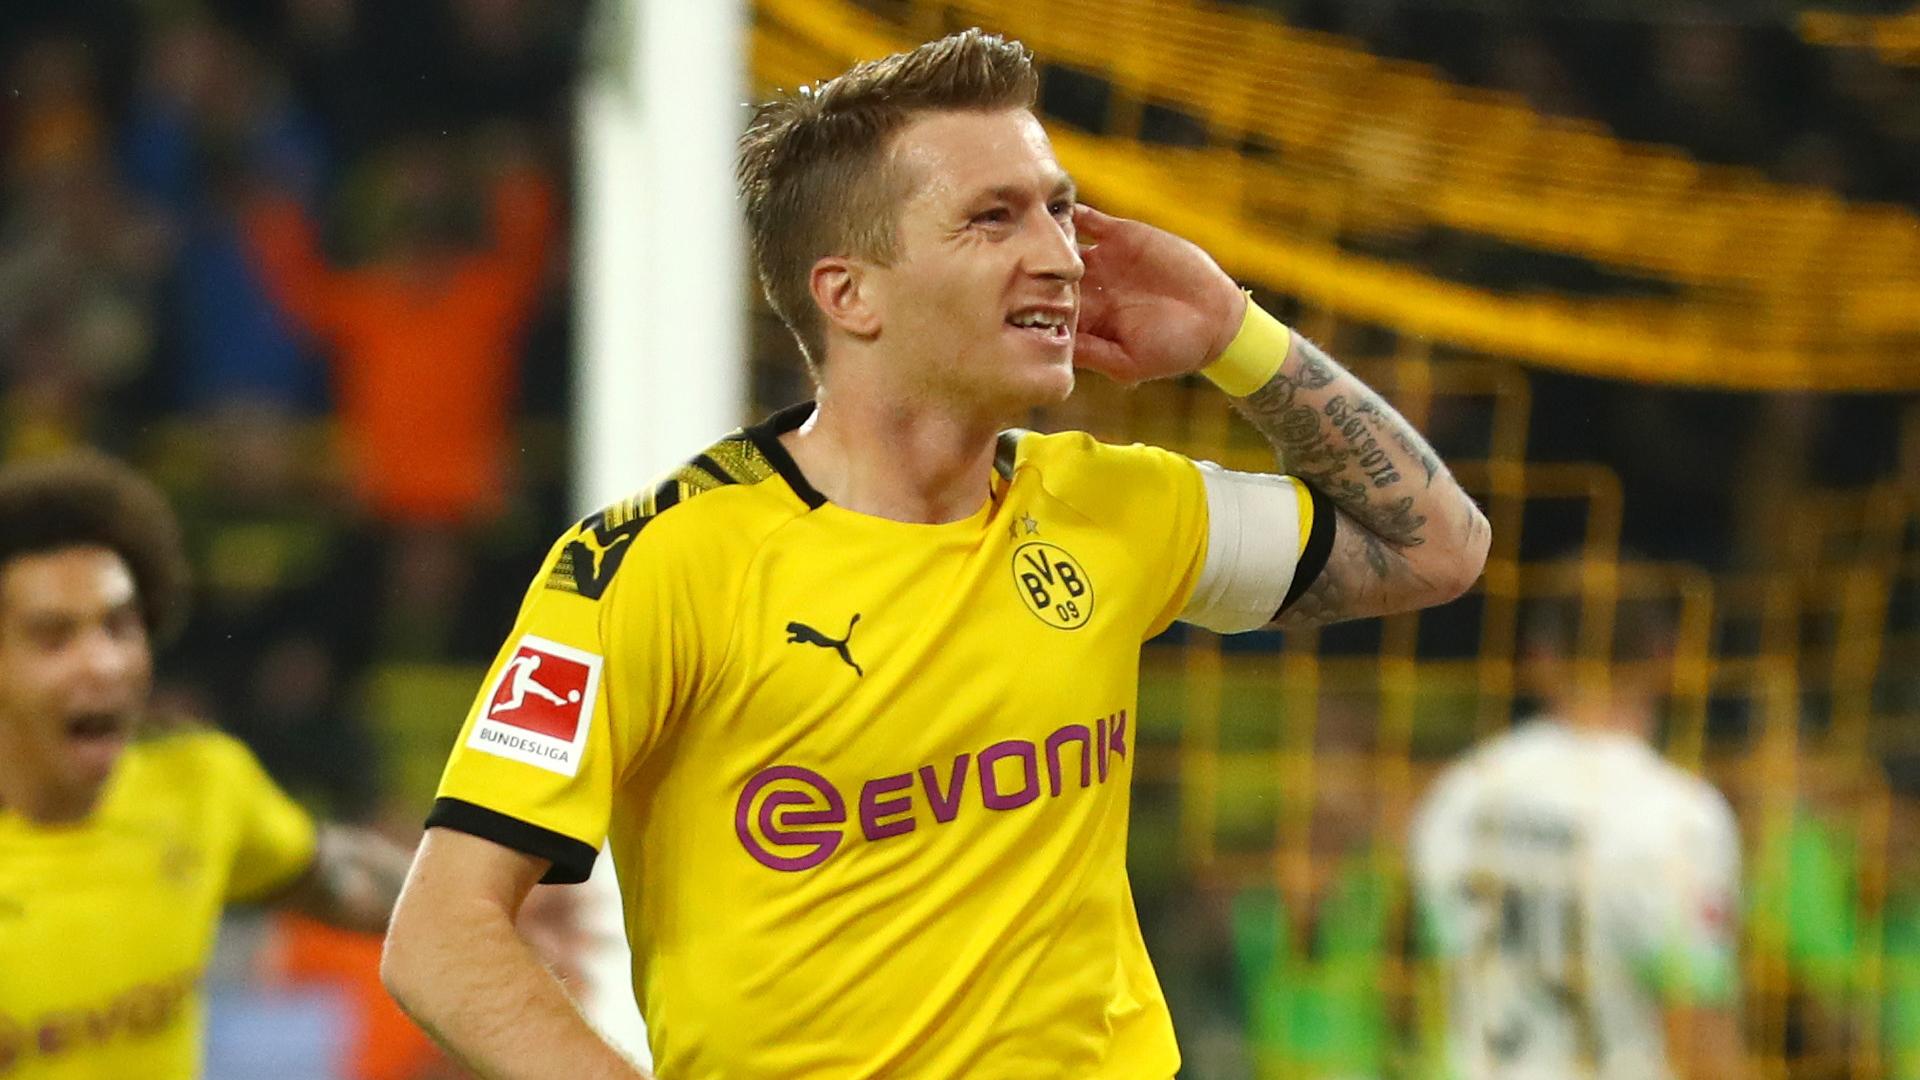 Sancho and Reus could miss Bayern Munich clash, Dortmund boss Favre confirms